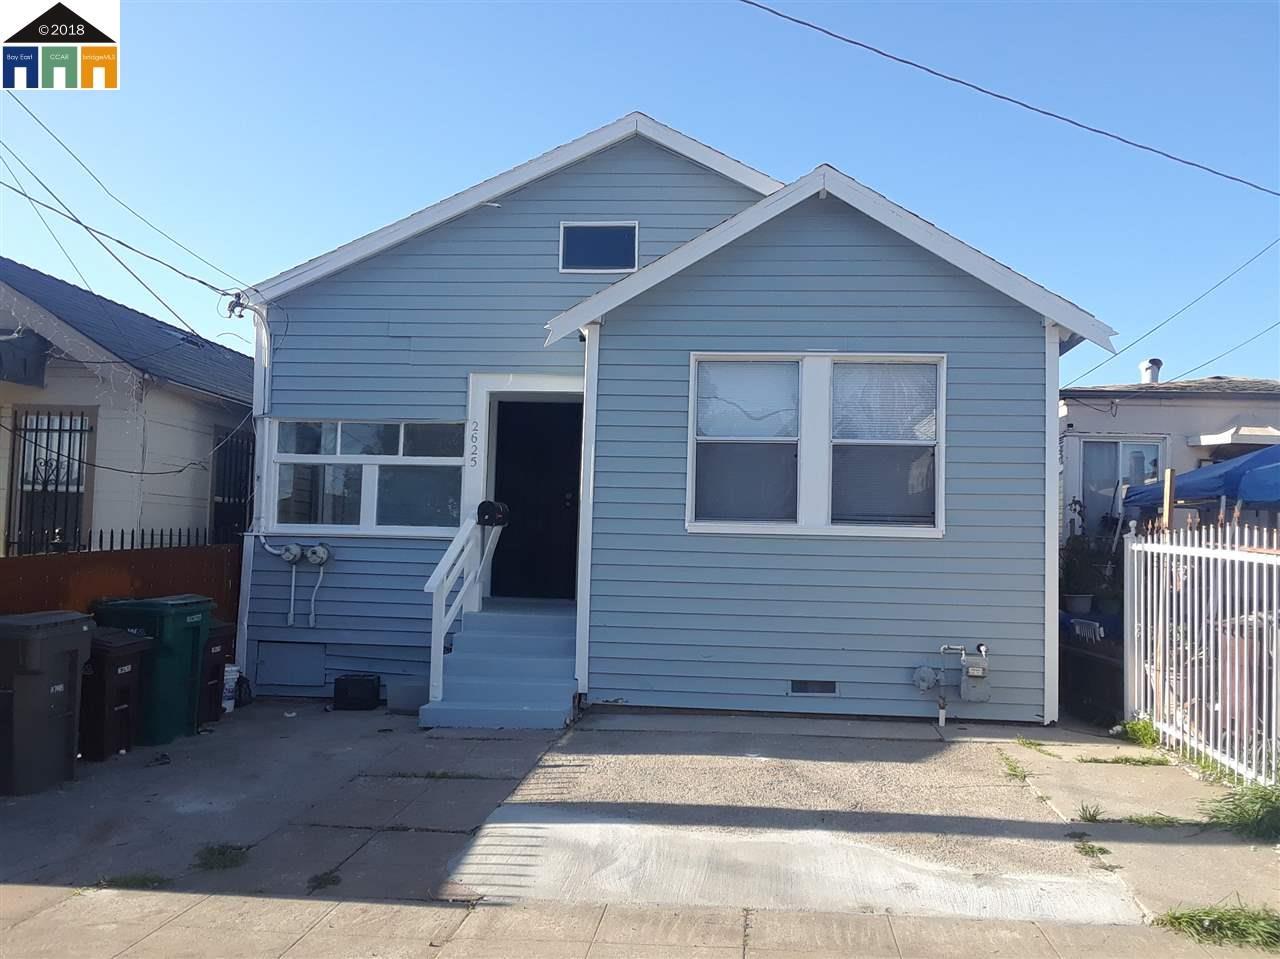 Single Family Home for Sale at 2625 75th Avenue 2625 75th Avenue Oakland, California 94605 United States